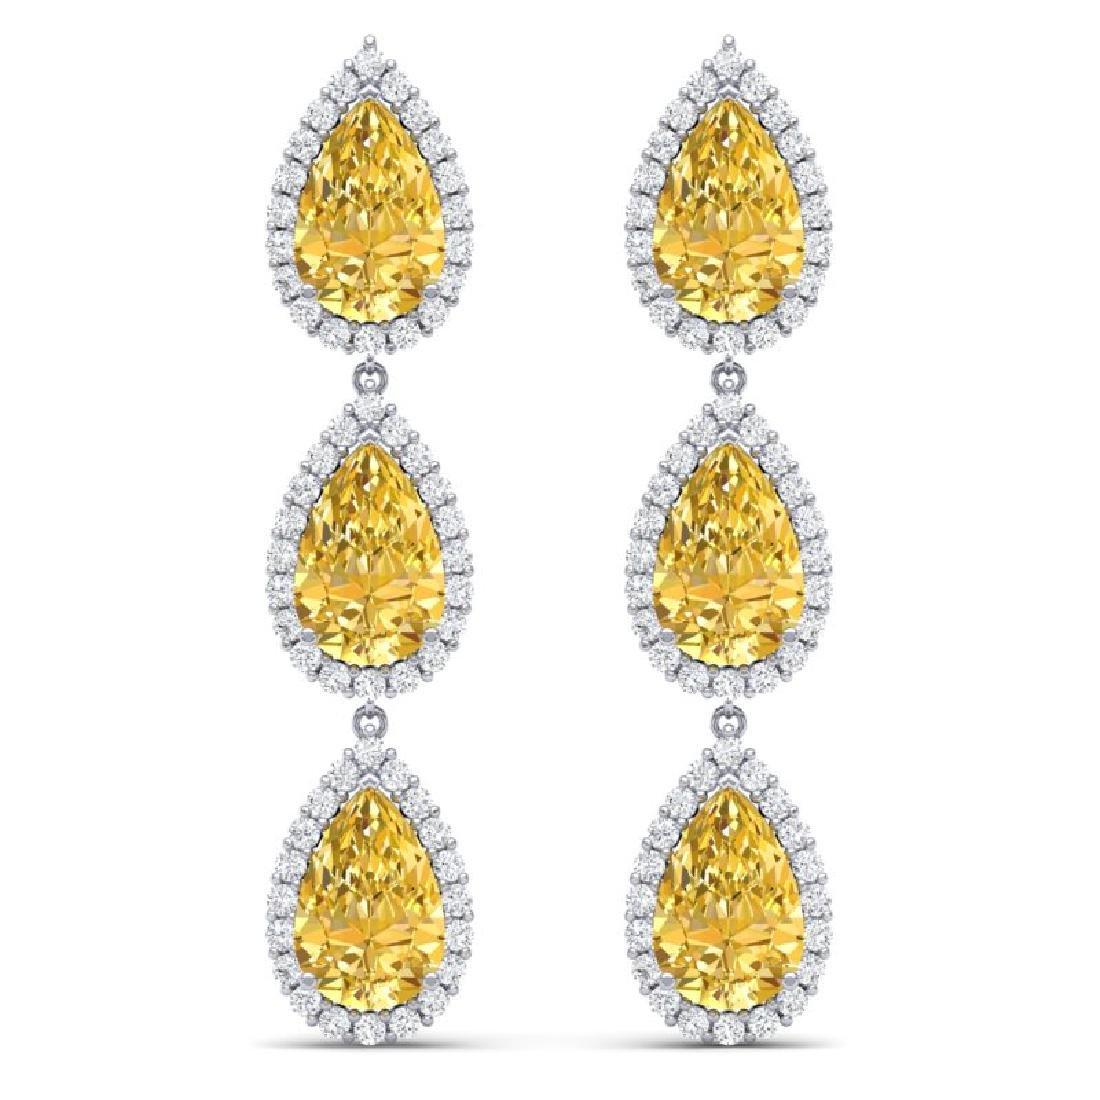 24.23 CTW Royalty Canary Citrine & VS Diamond Earrings